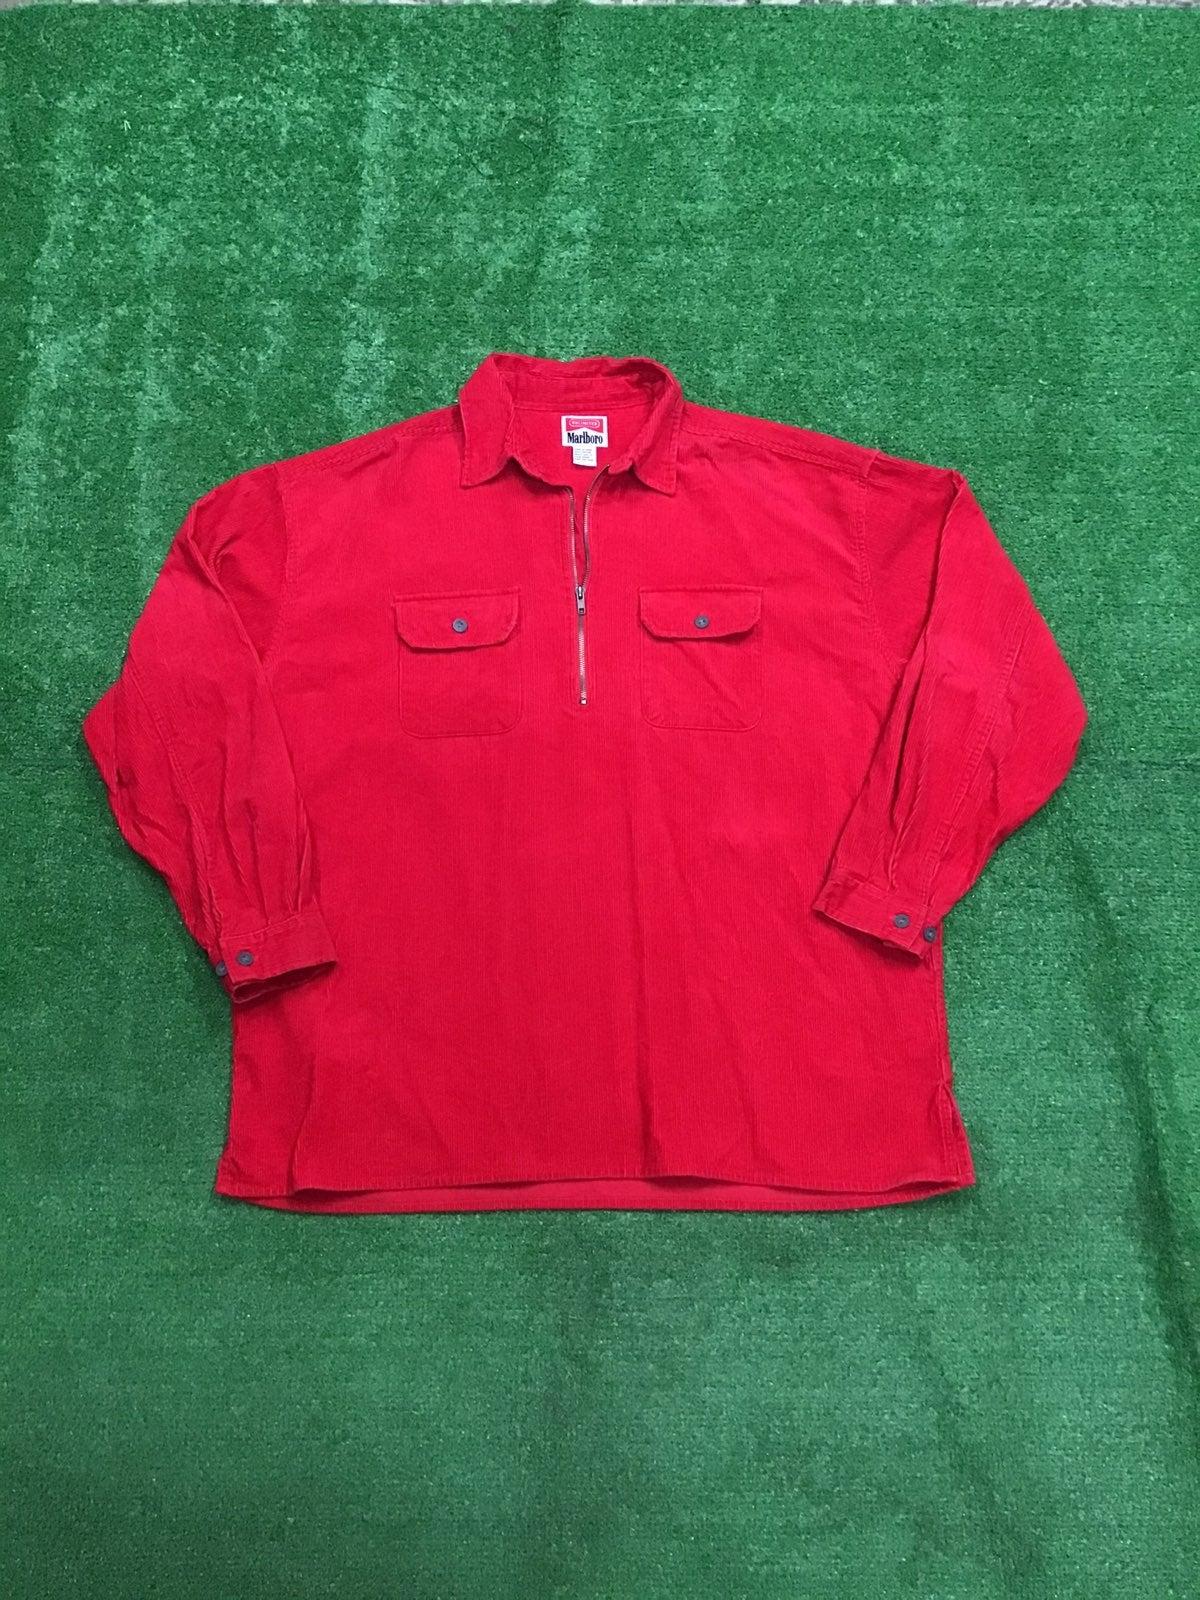 Vintage Marlboro Corduroy Shirt